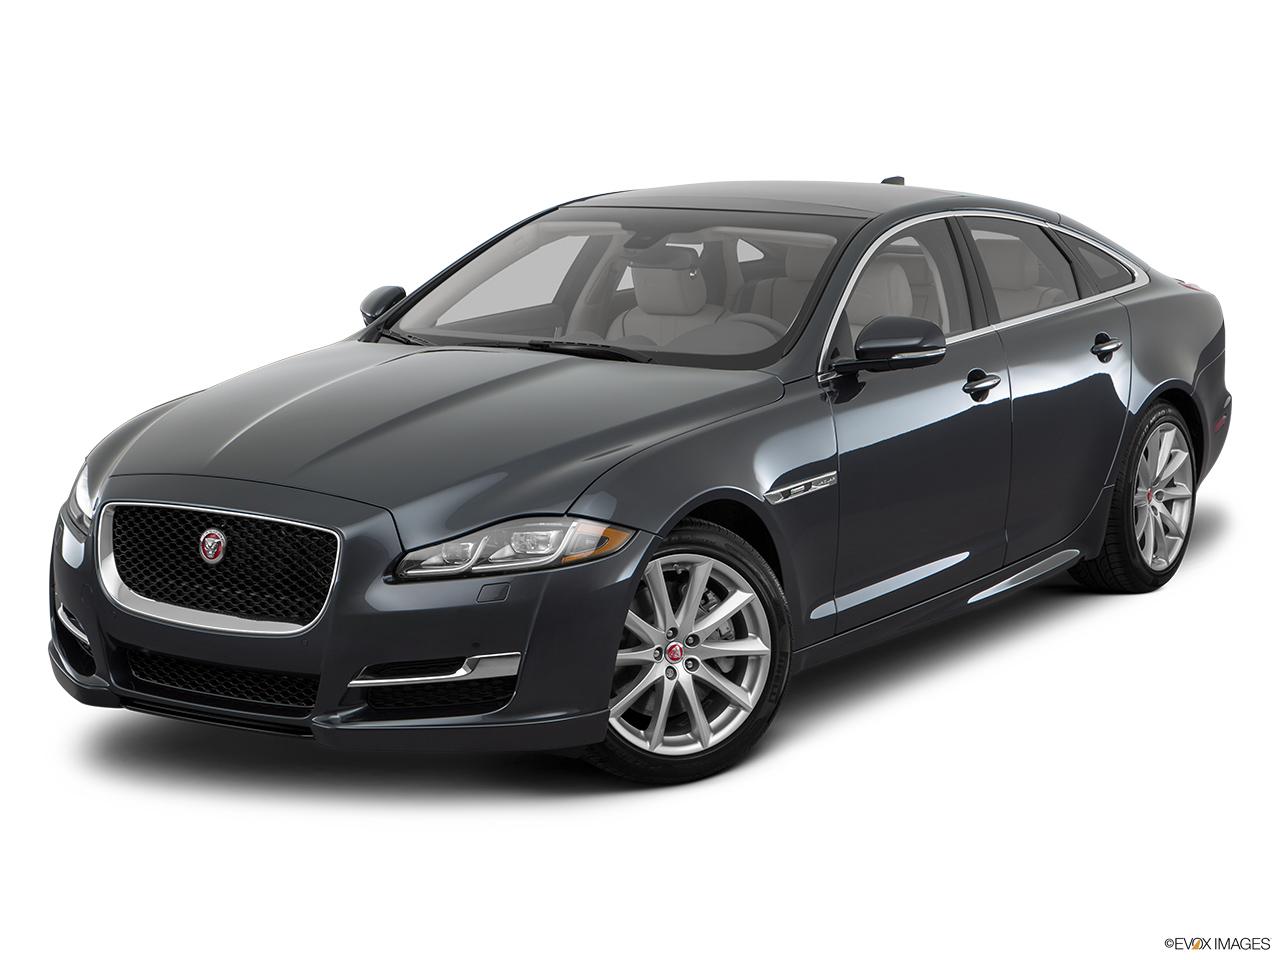 jaguar xj price in uae new jaguar xj photos and specs yallamotor. Black Bedroom Furniture Sets. Home Design Ideas